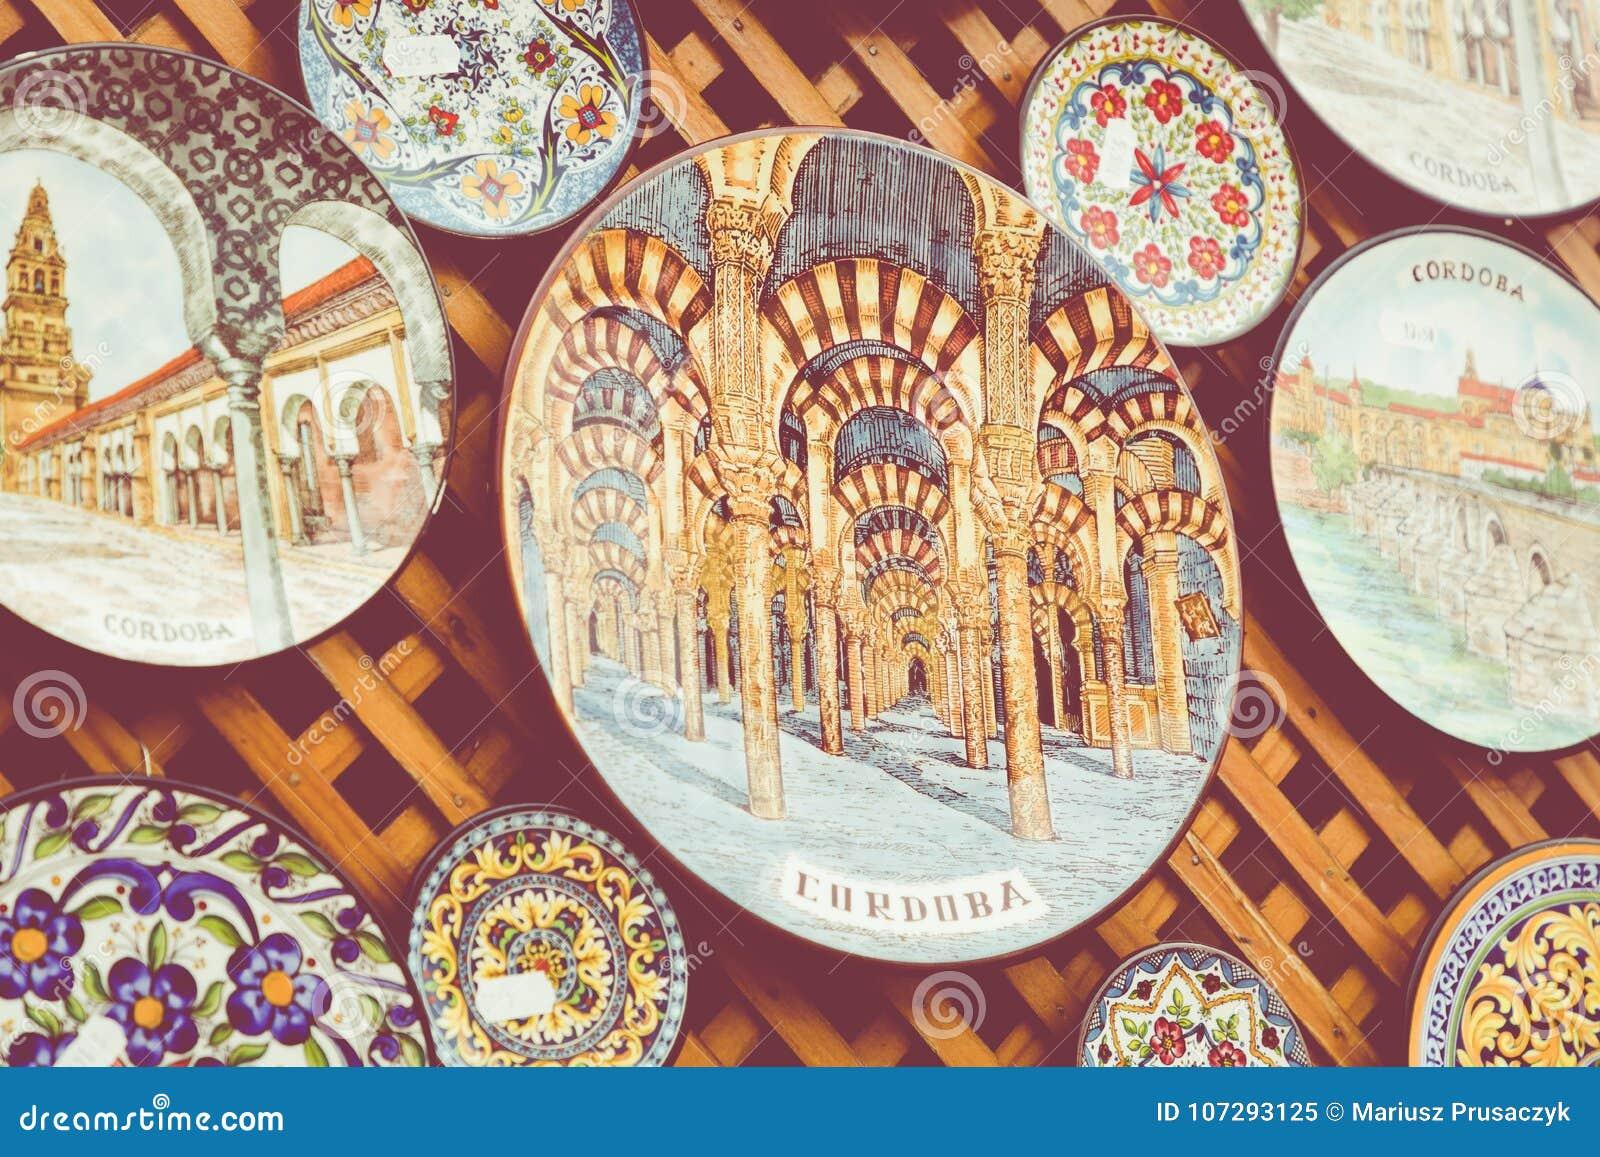 Ceramics Plates At Local Souvenir Shop In Cordoba, Andalusia